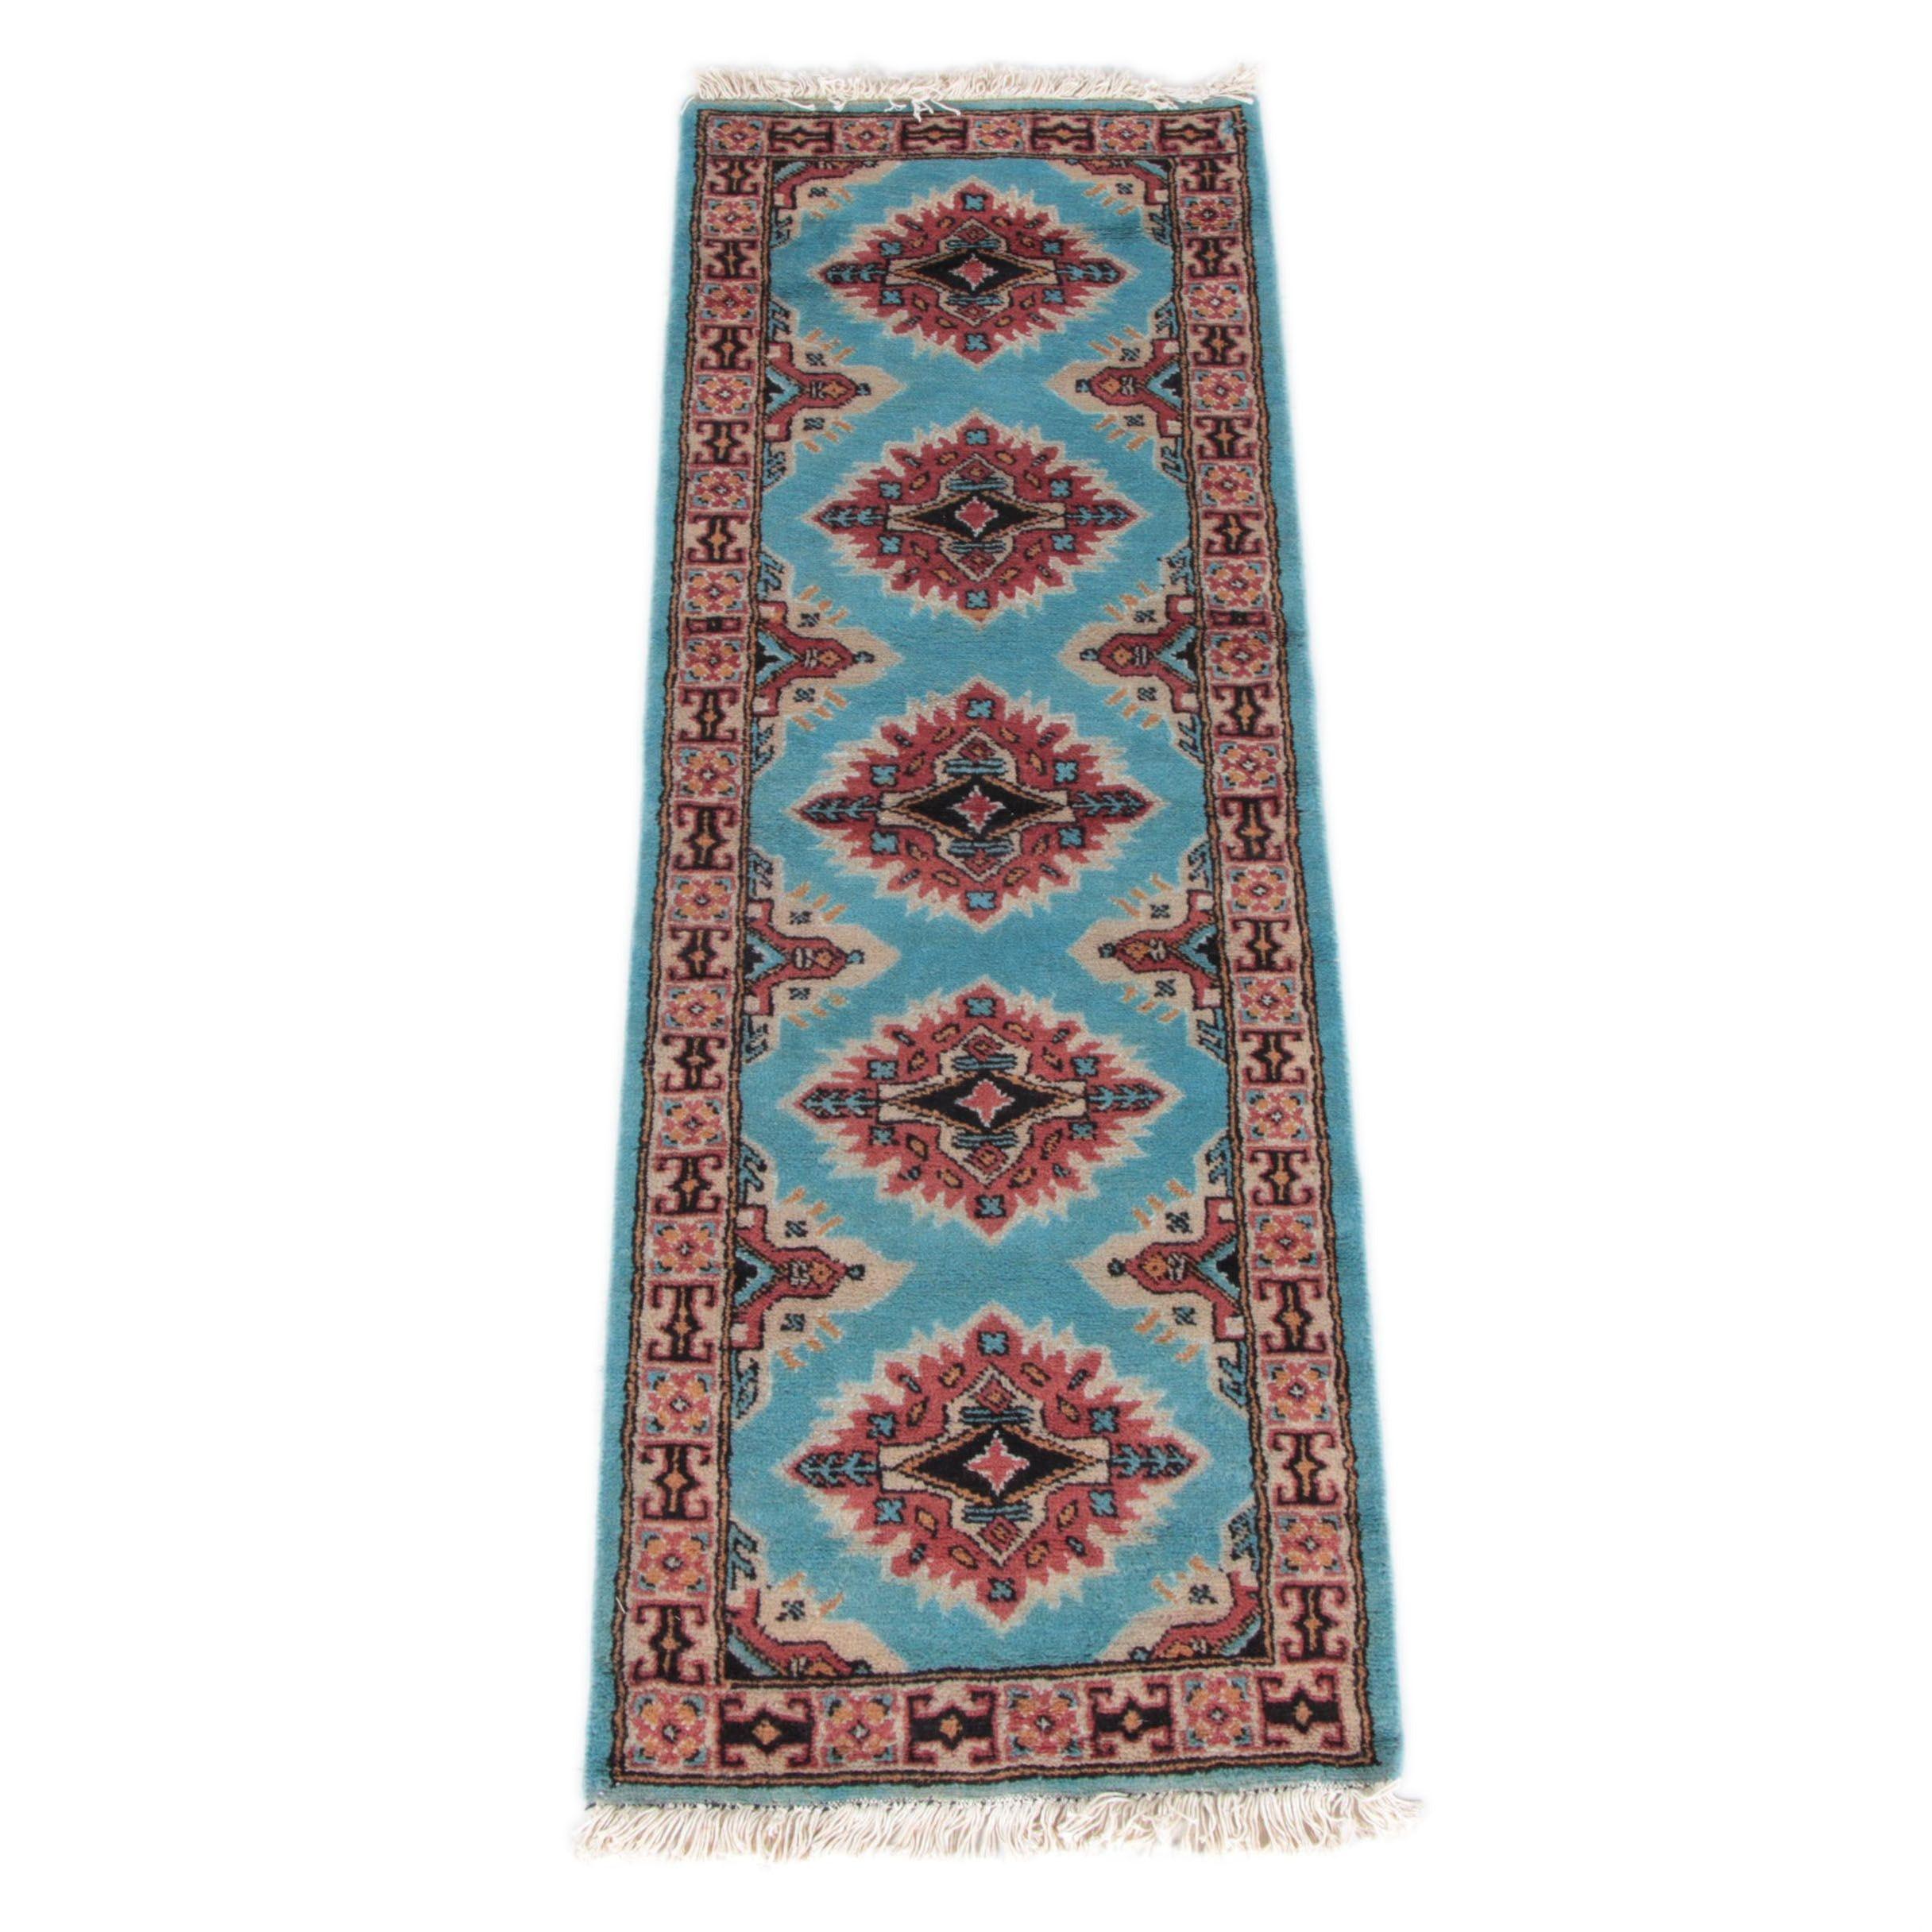 Hand-Knotted Pak-Kazak Bokhara Carpet Runner